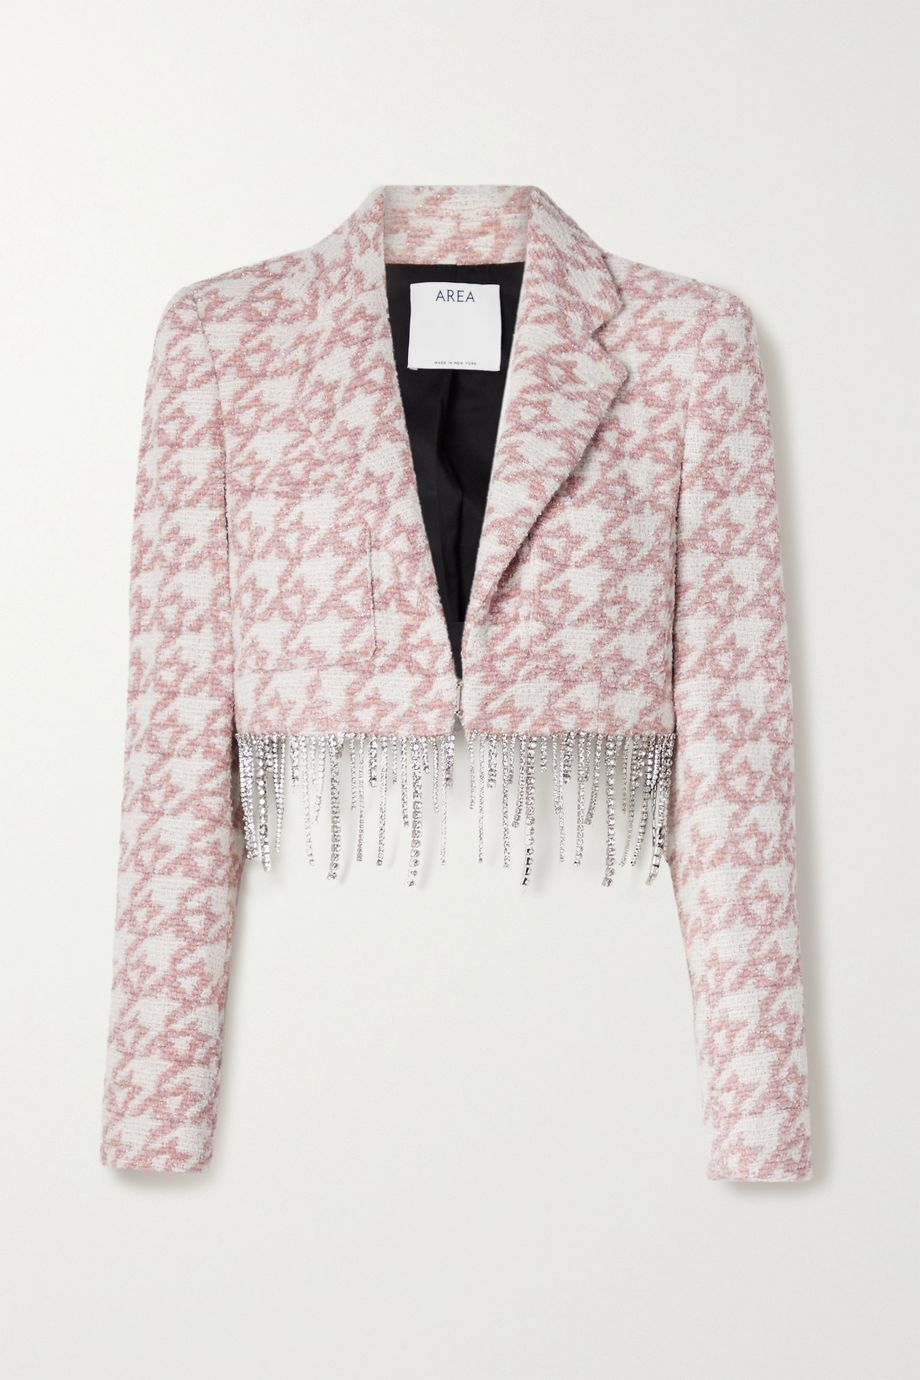 AREA Cropped crystal-embellished metallic houndstooth tweed blazer